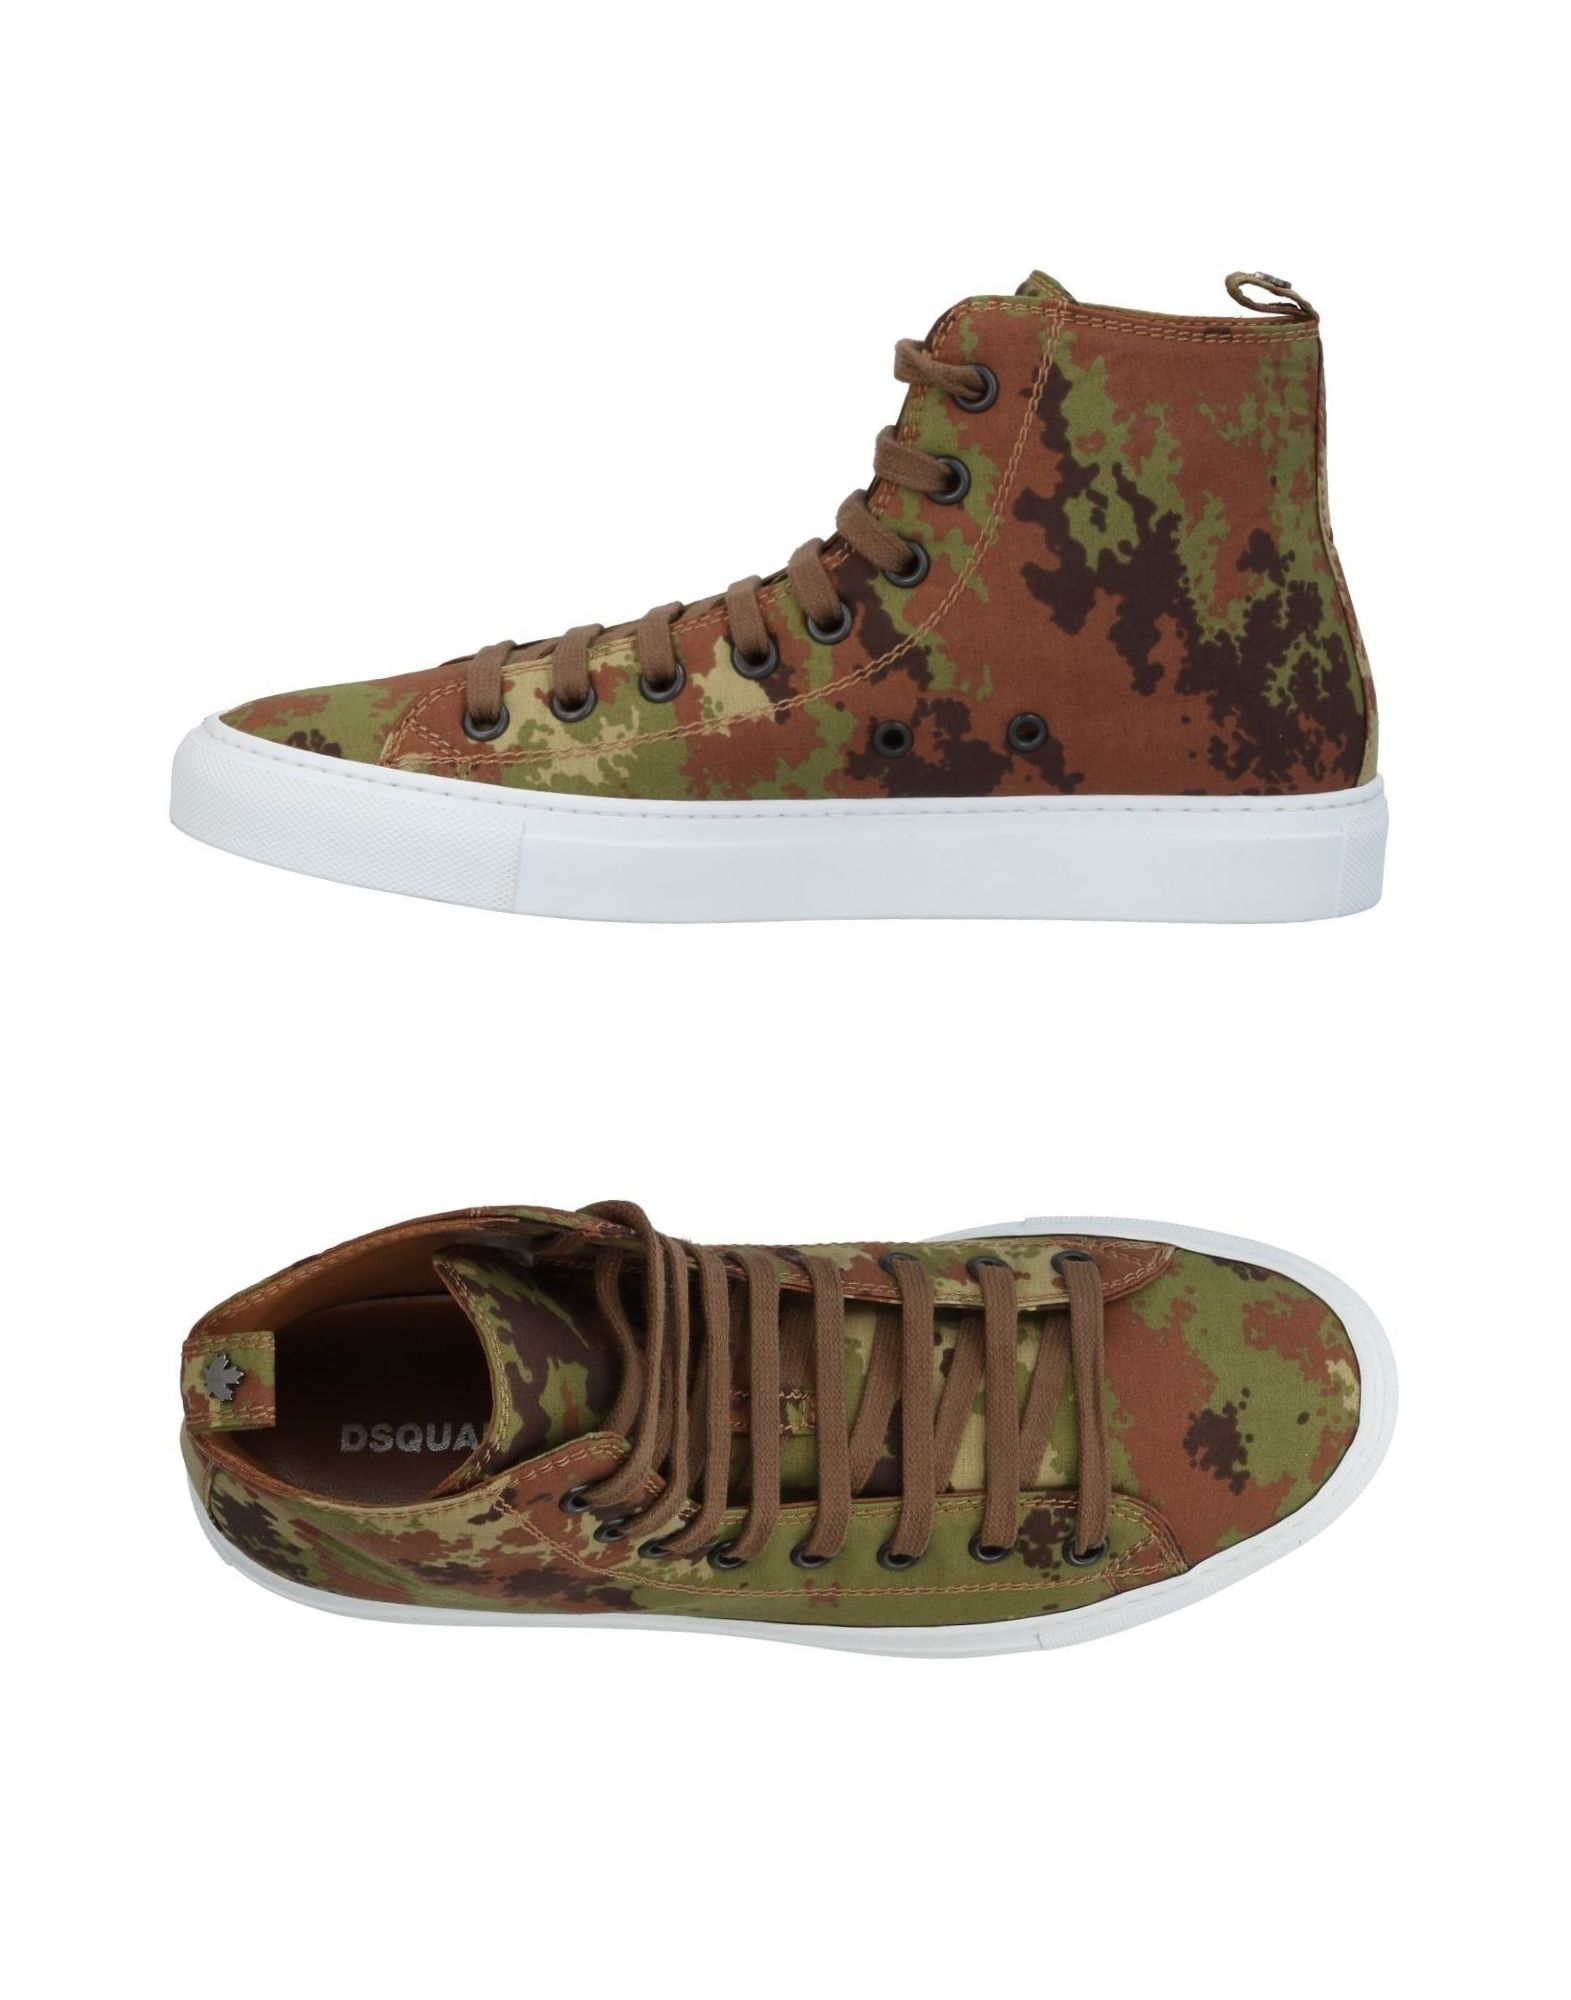 Dsquared2 Gute Sneakers Herren  11428735EI Gute Dsquared2 Qualität beliebte Schuhe 3d8163